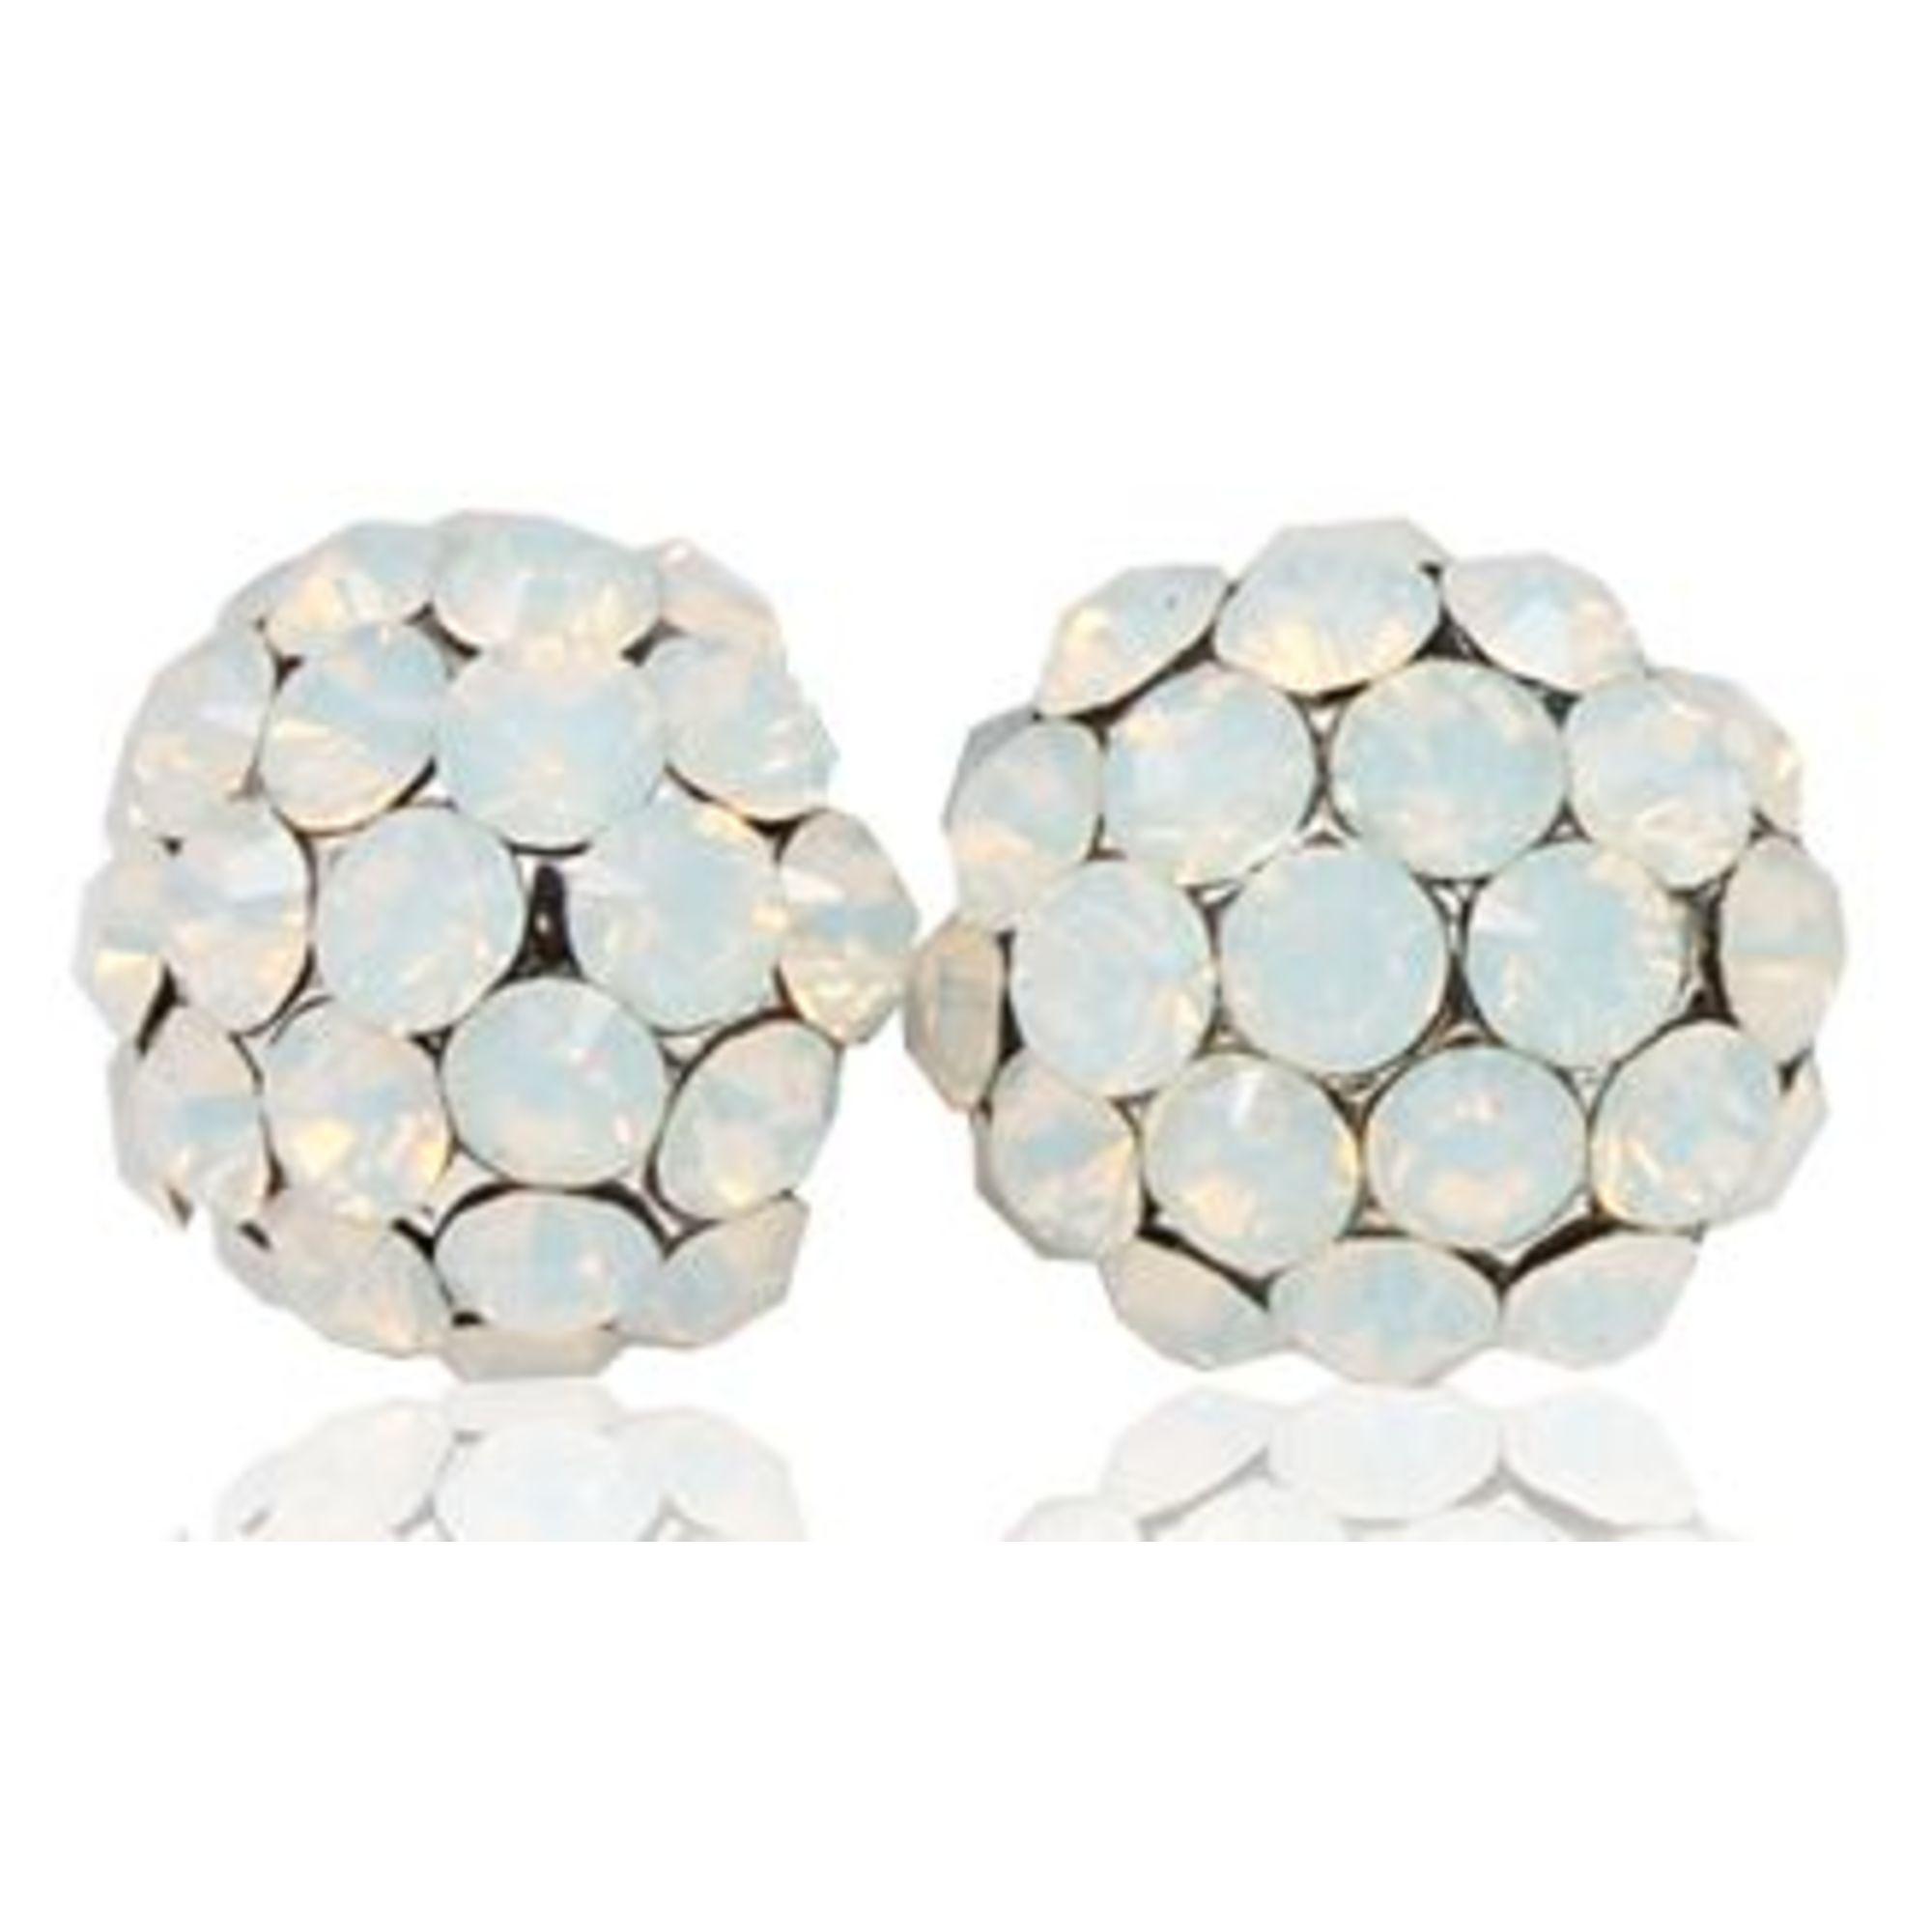 Ball Earring - White Opal